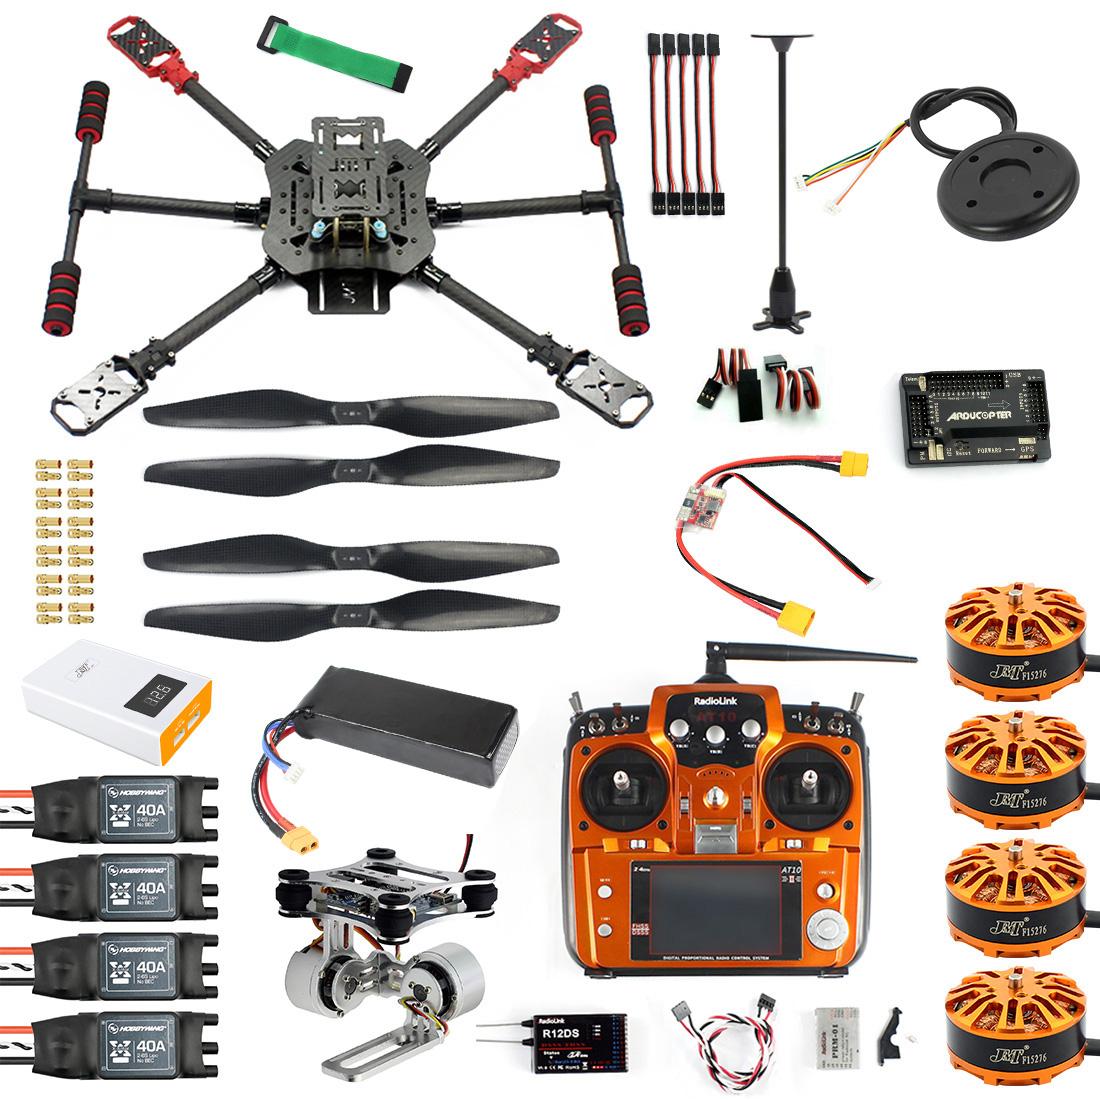 diy gps drone 2 4ghz 10ch x4 560mm umbrella foldable rc quadcopter 4-axis  arf unassemble apm w/ gimbal fpv quadcopter item no: kf24432-b